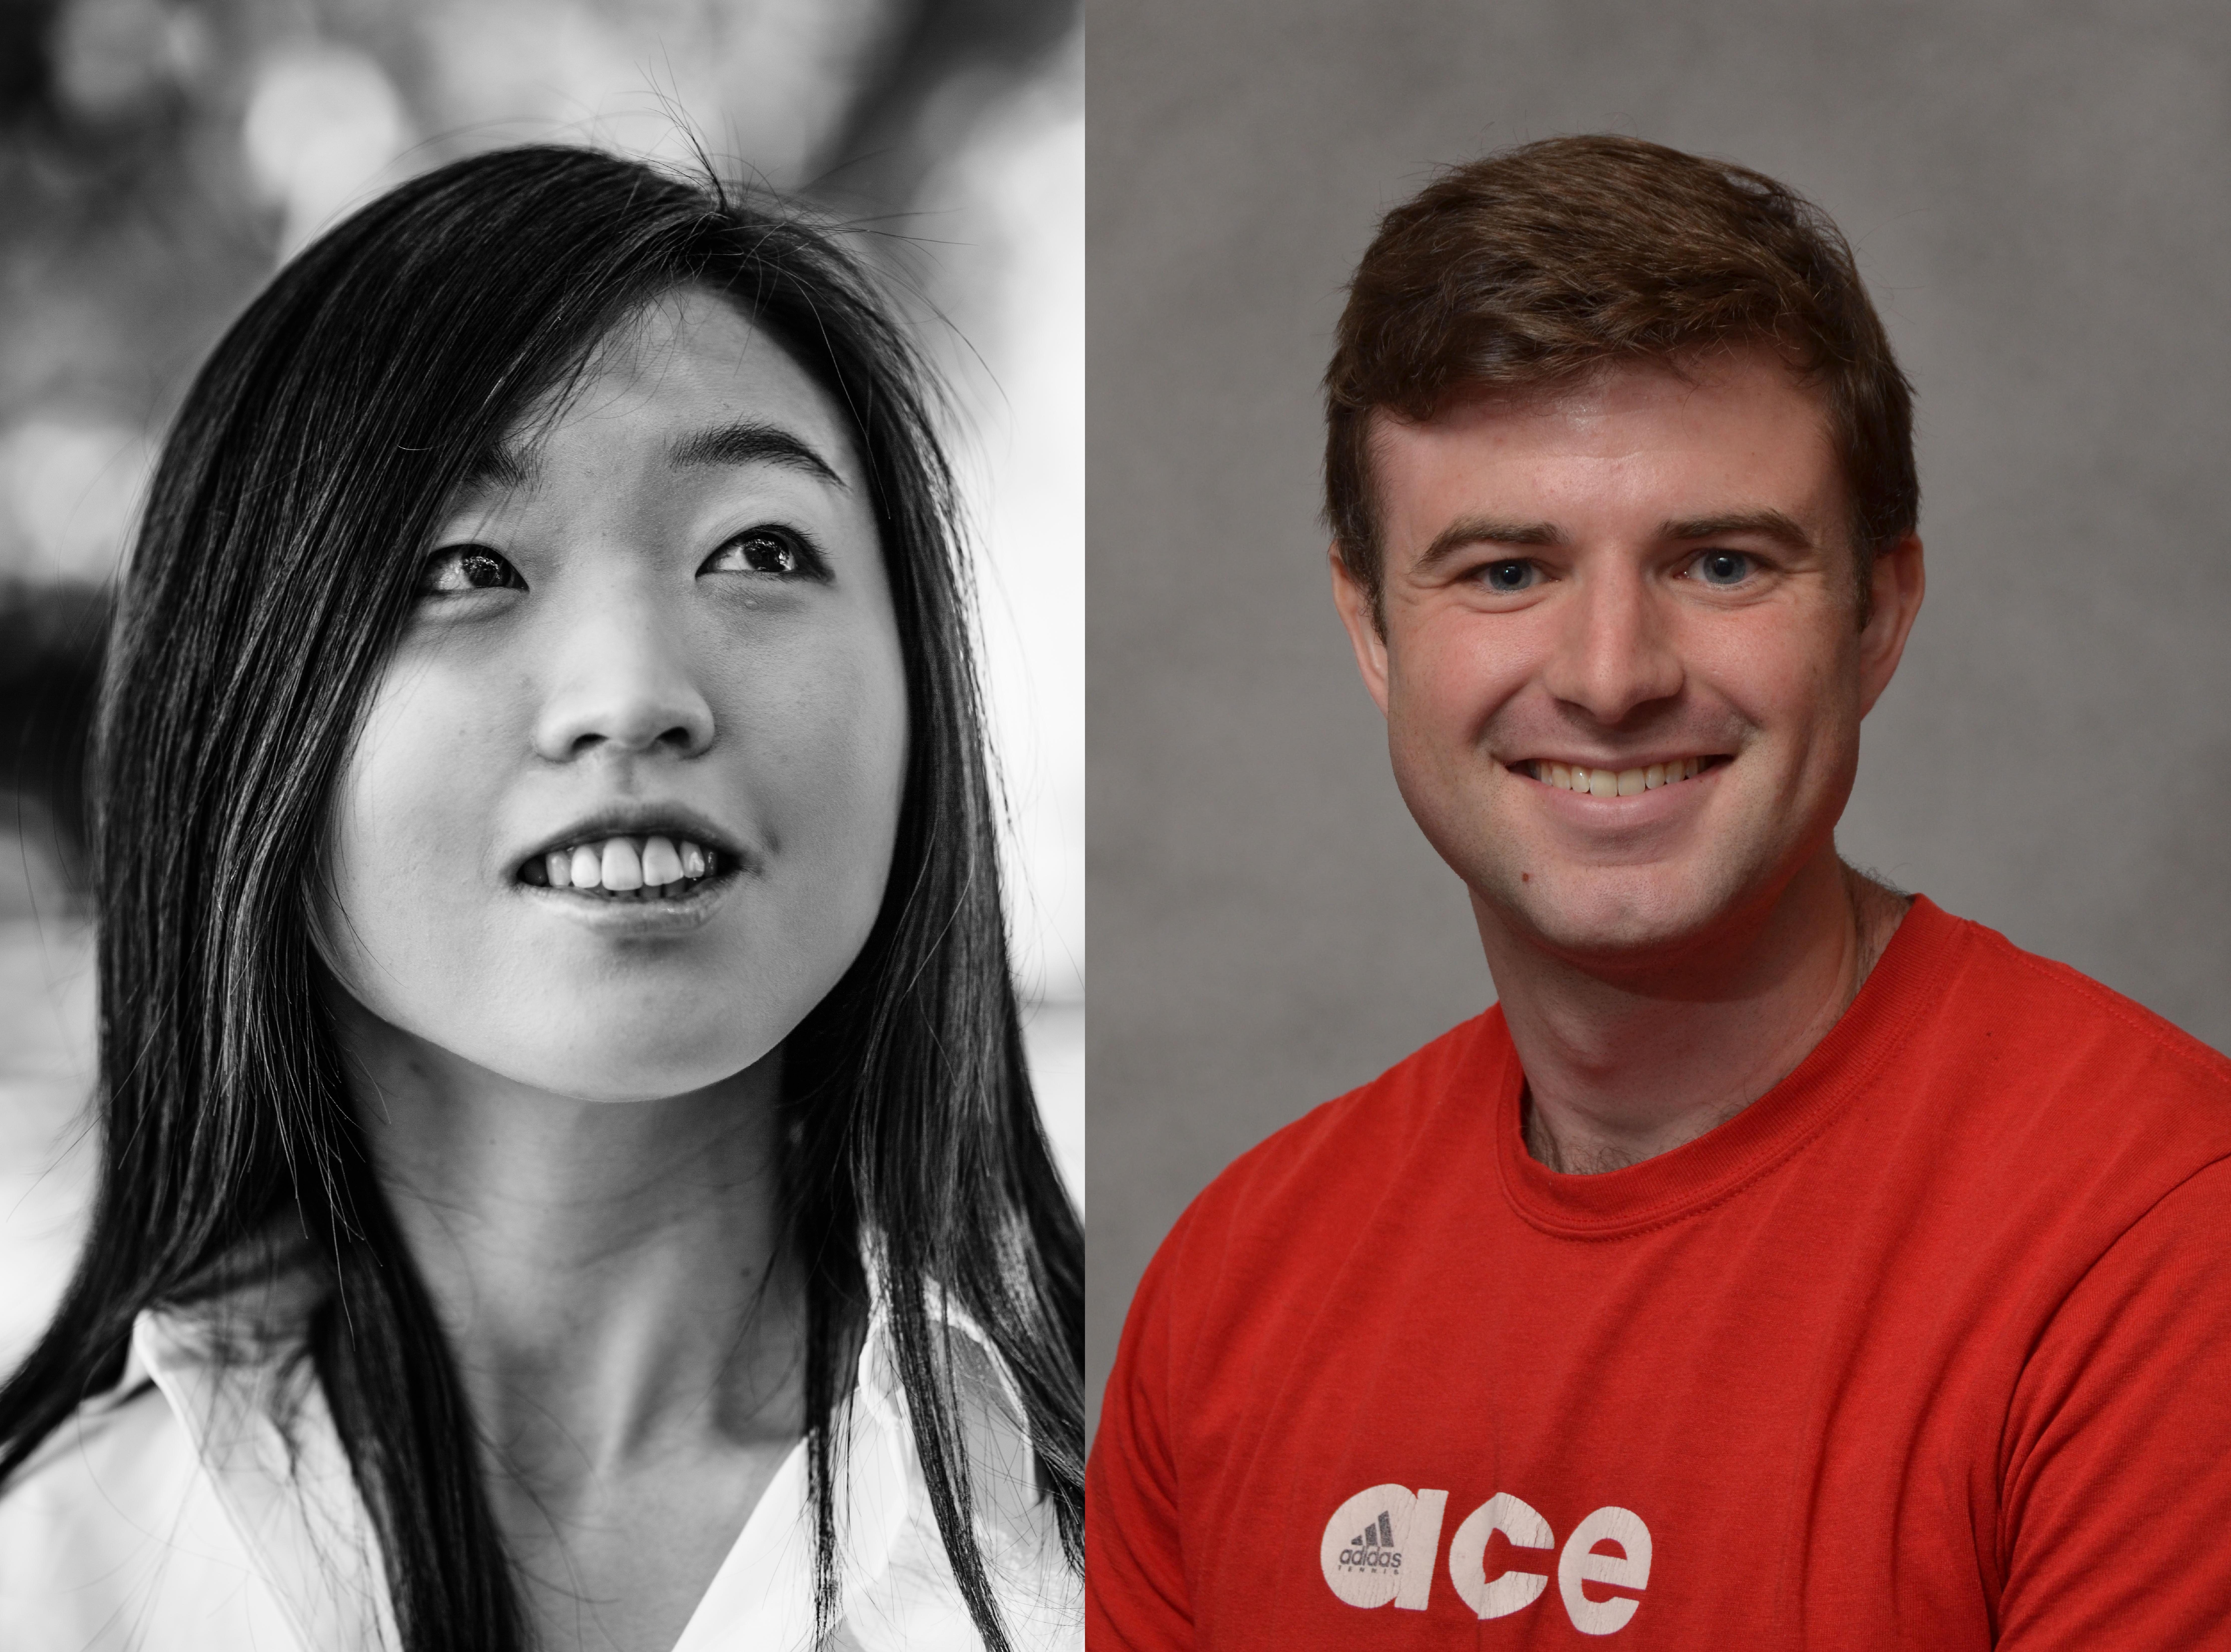 Headshots of Yoo Jung Kim and Erik Faber